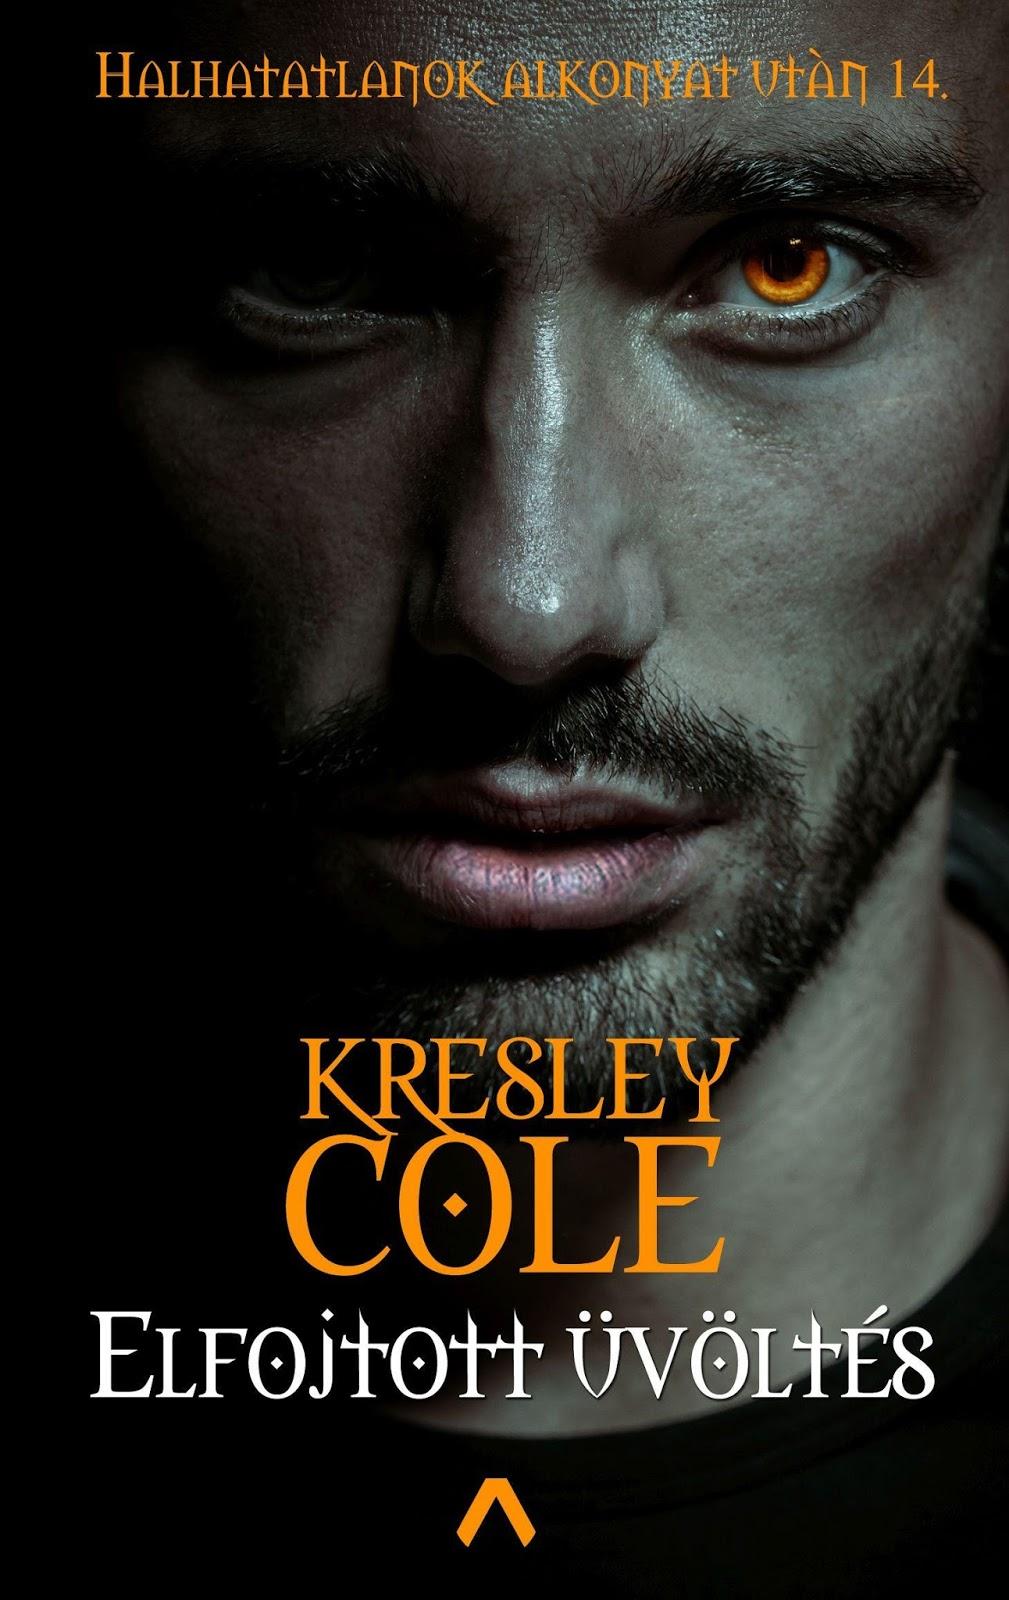 Cole macrieve pdf kresley